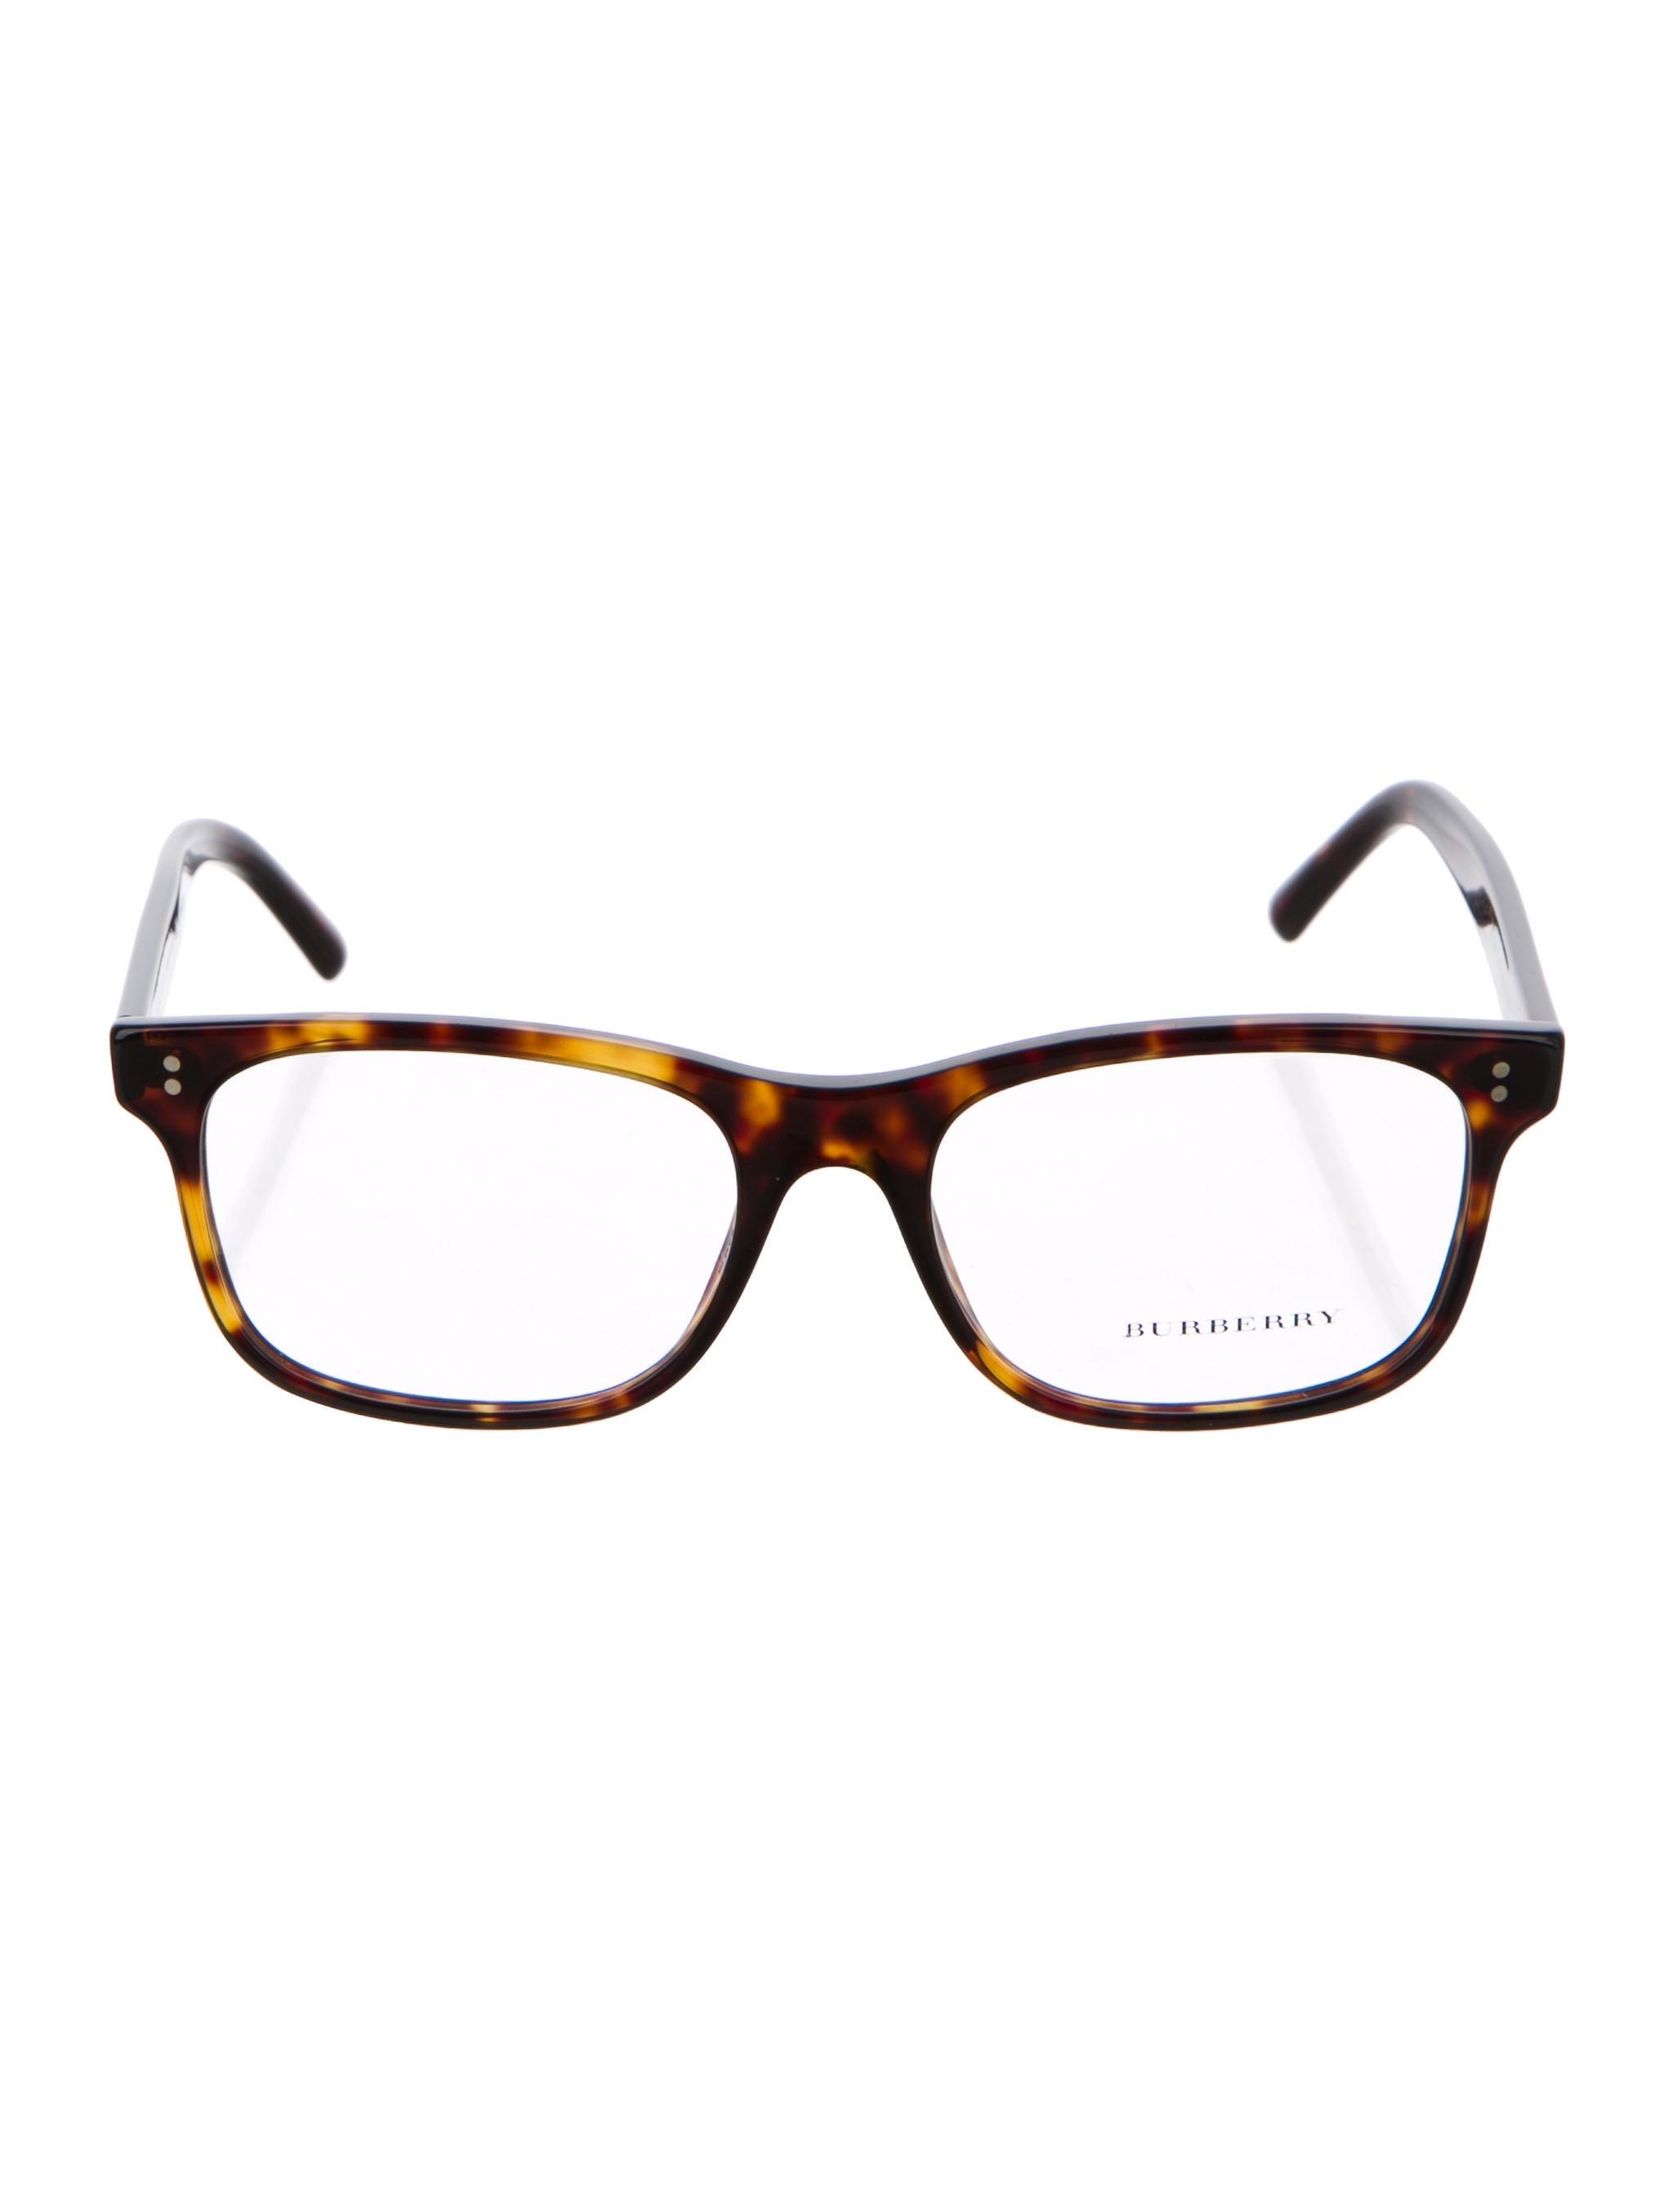 48d03a23efef Burberry Tortoiseshell Square Eyeglasses - Accessories - BUR97436 ...